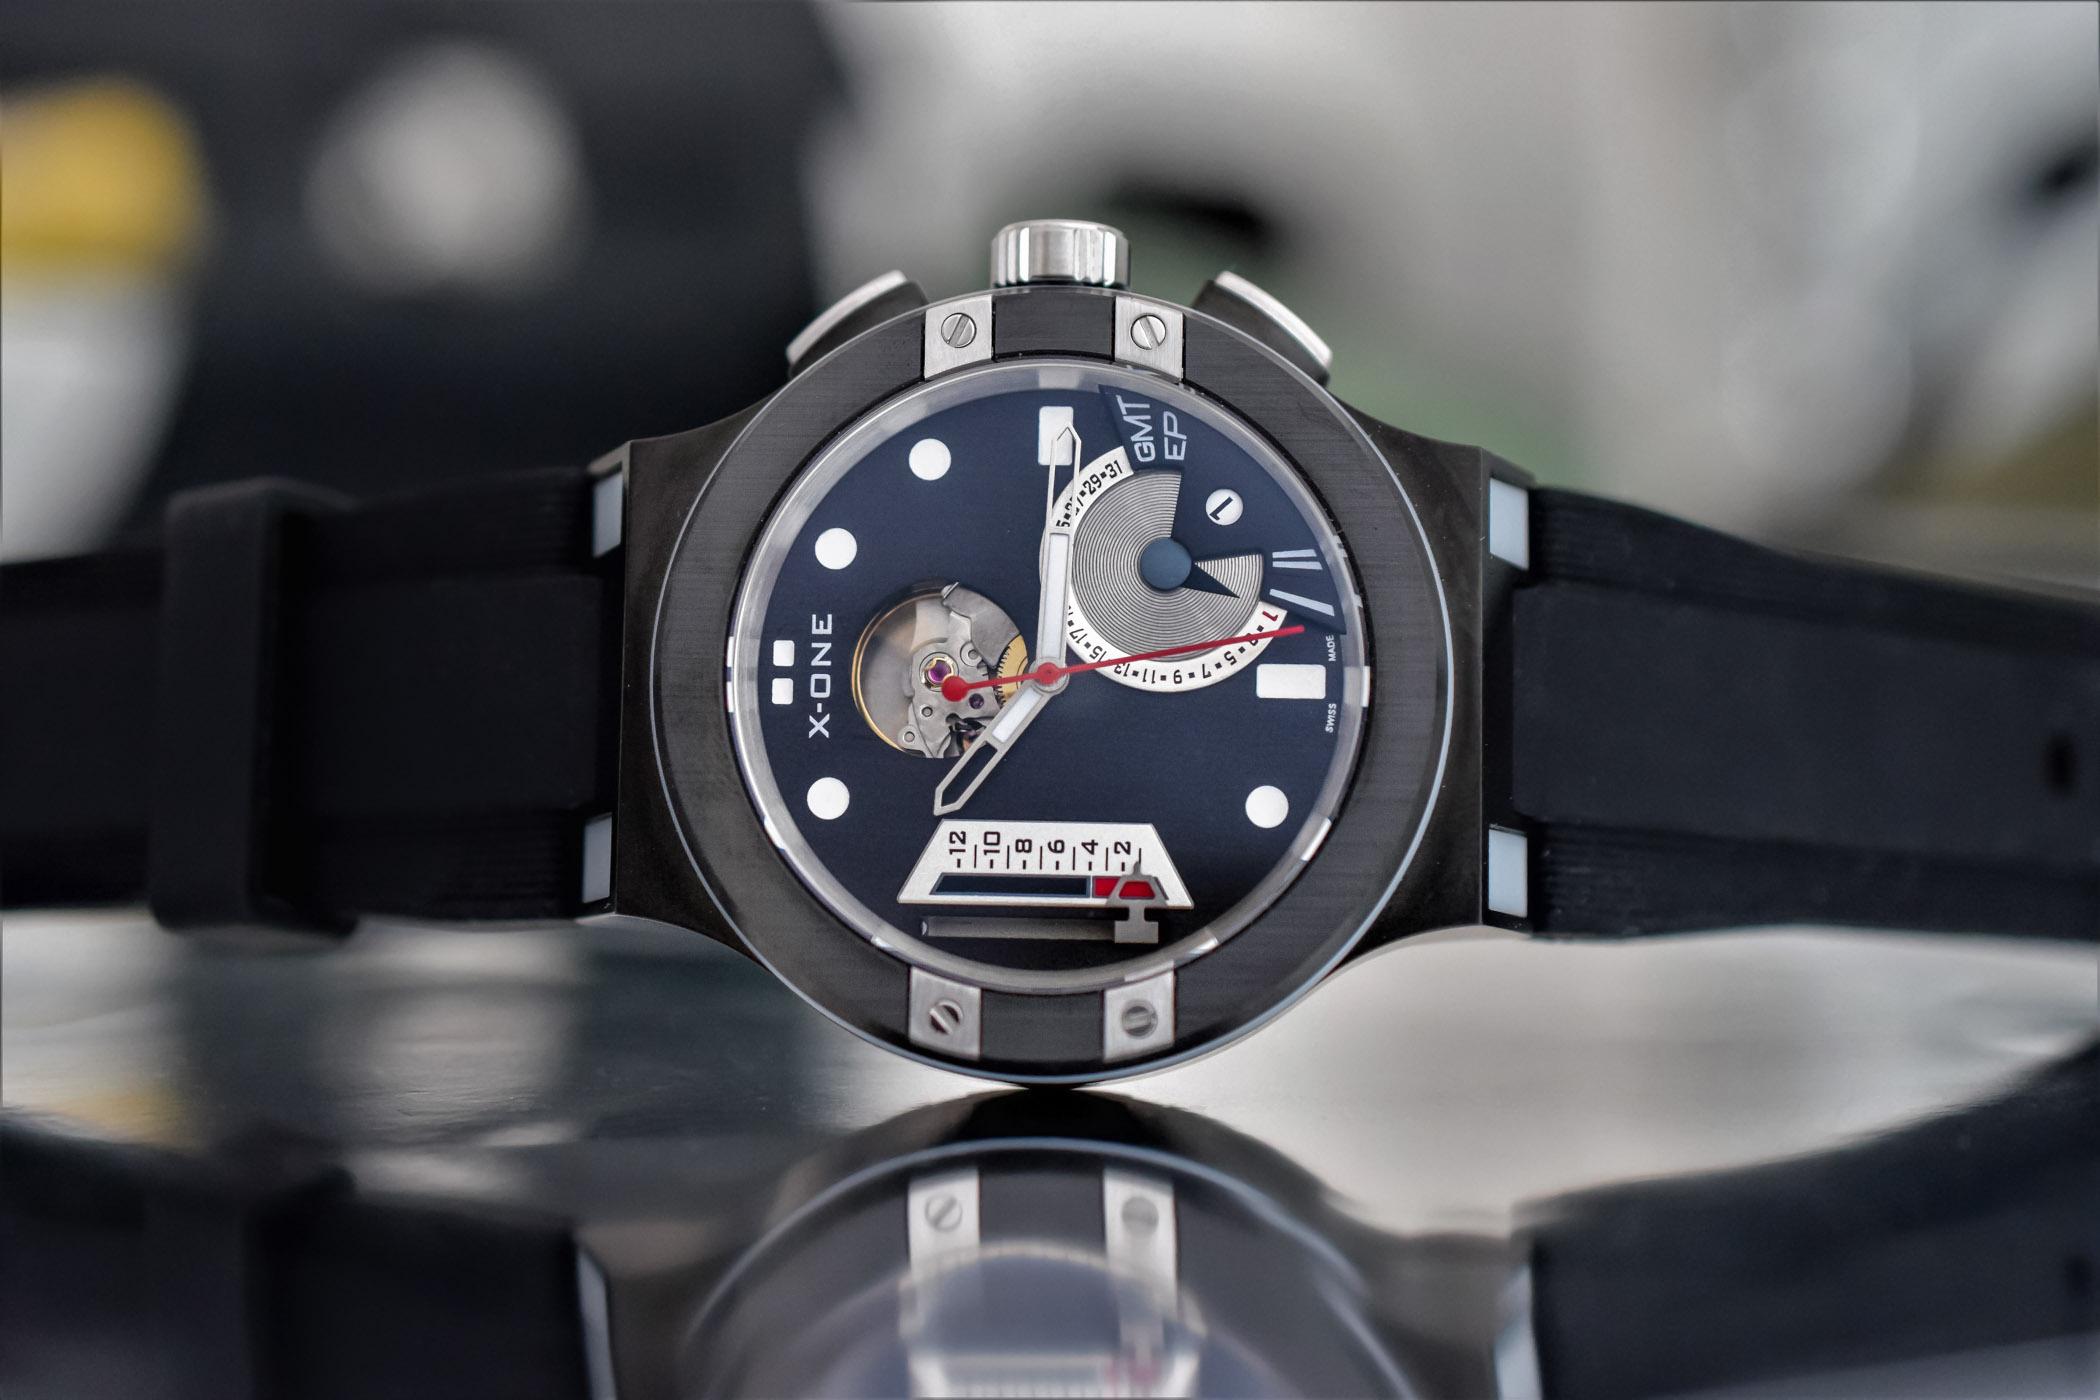 Conex Watches X-ONE H1 - Hybrid mechanical smartwatch